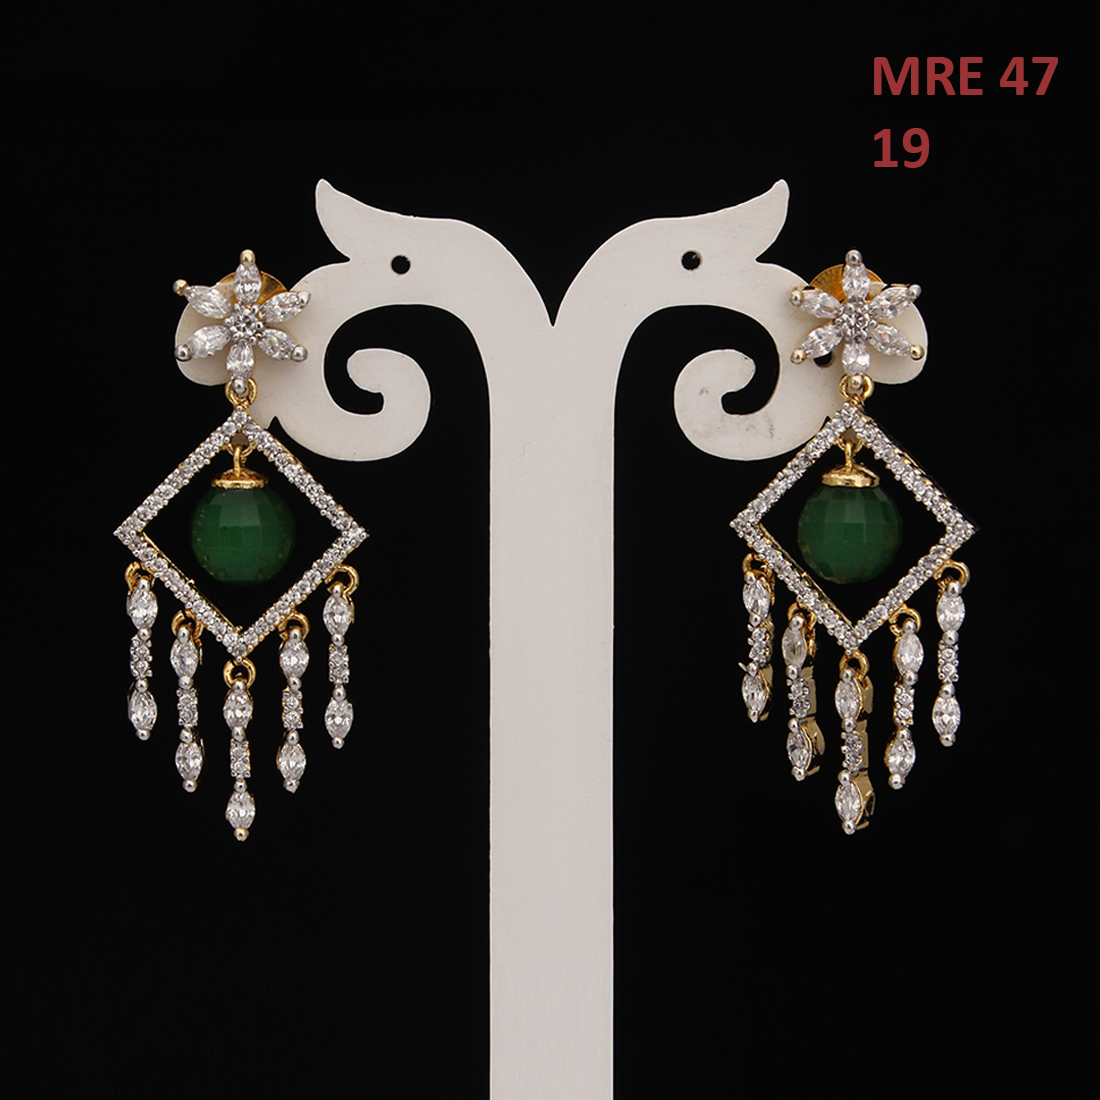 55Carat | Indian Handmade Teardrop Earrings For Women Girls Ladies Cubic Zircon Gold Plated Baali Kundal Jewellery Designer Jewellery MRE 47